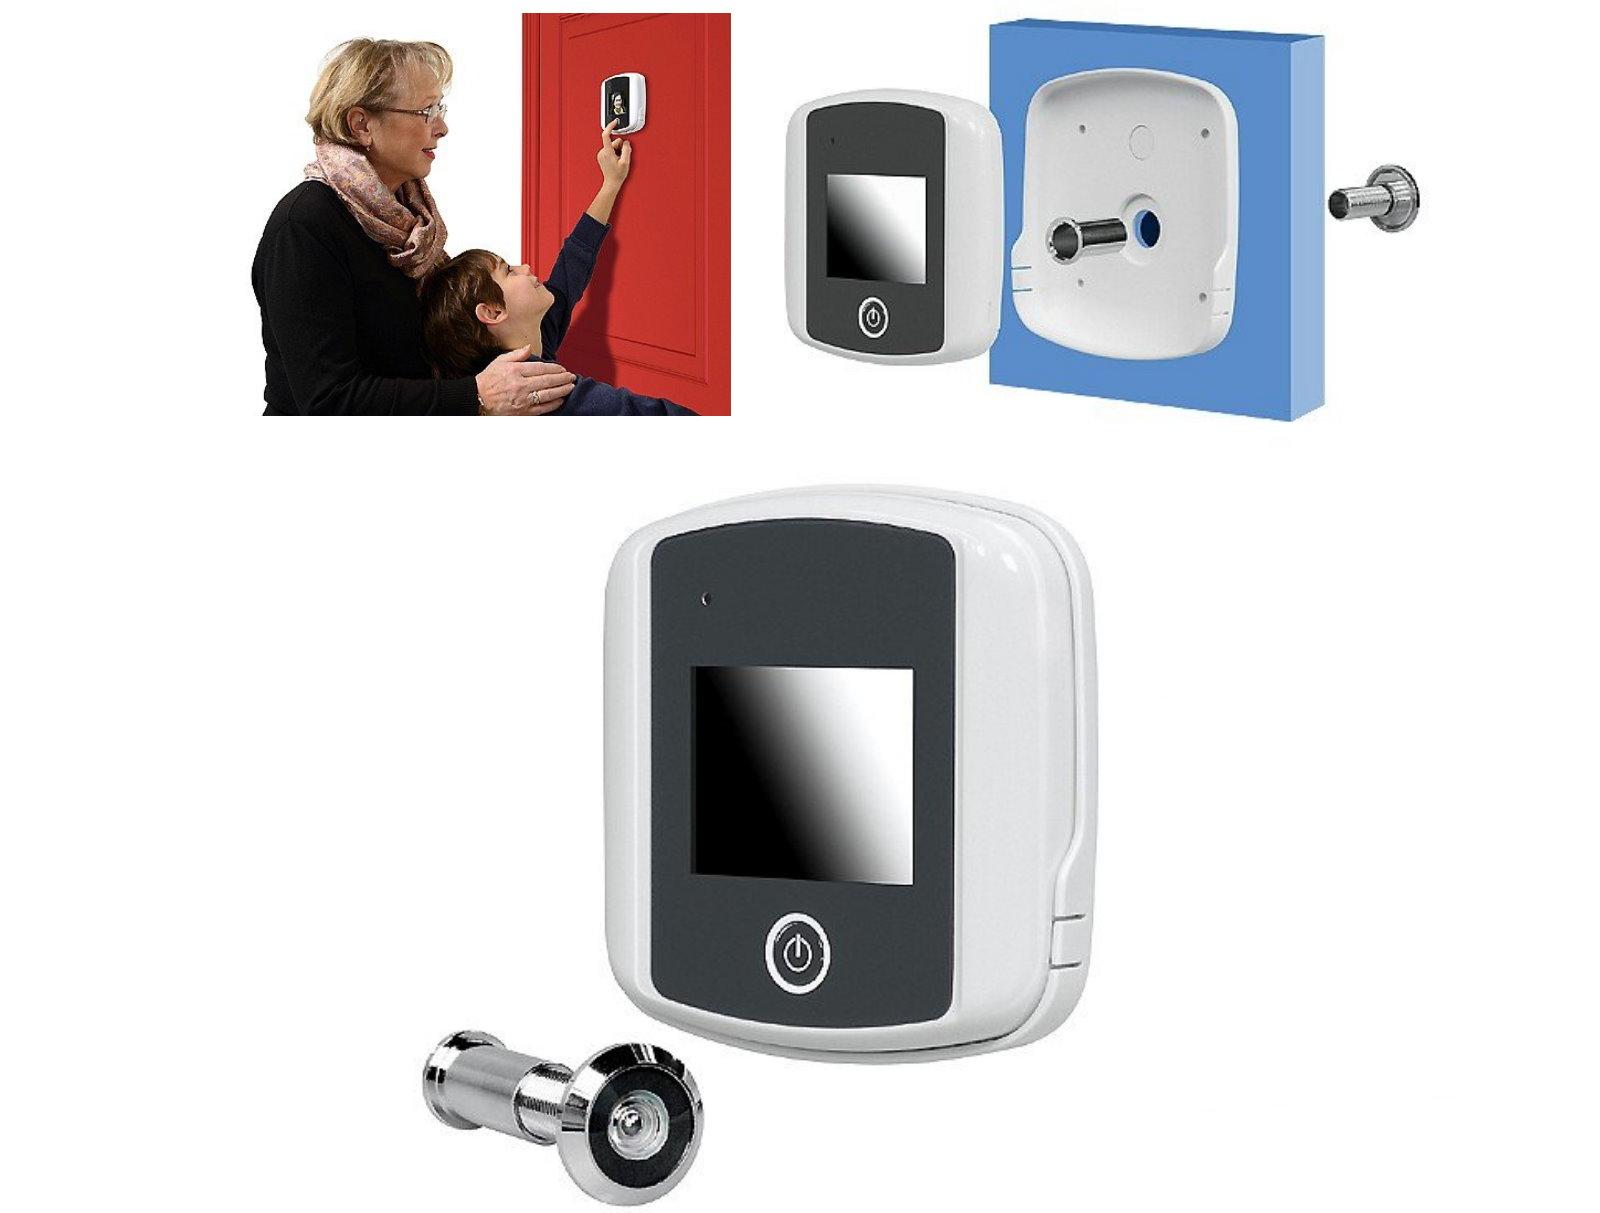 pentatech digitaler t rspion t r lcd farbdisplay t rkamera digital spion kamera. Black Bedroom Furniture Sets. Home Design Ideas